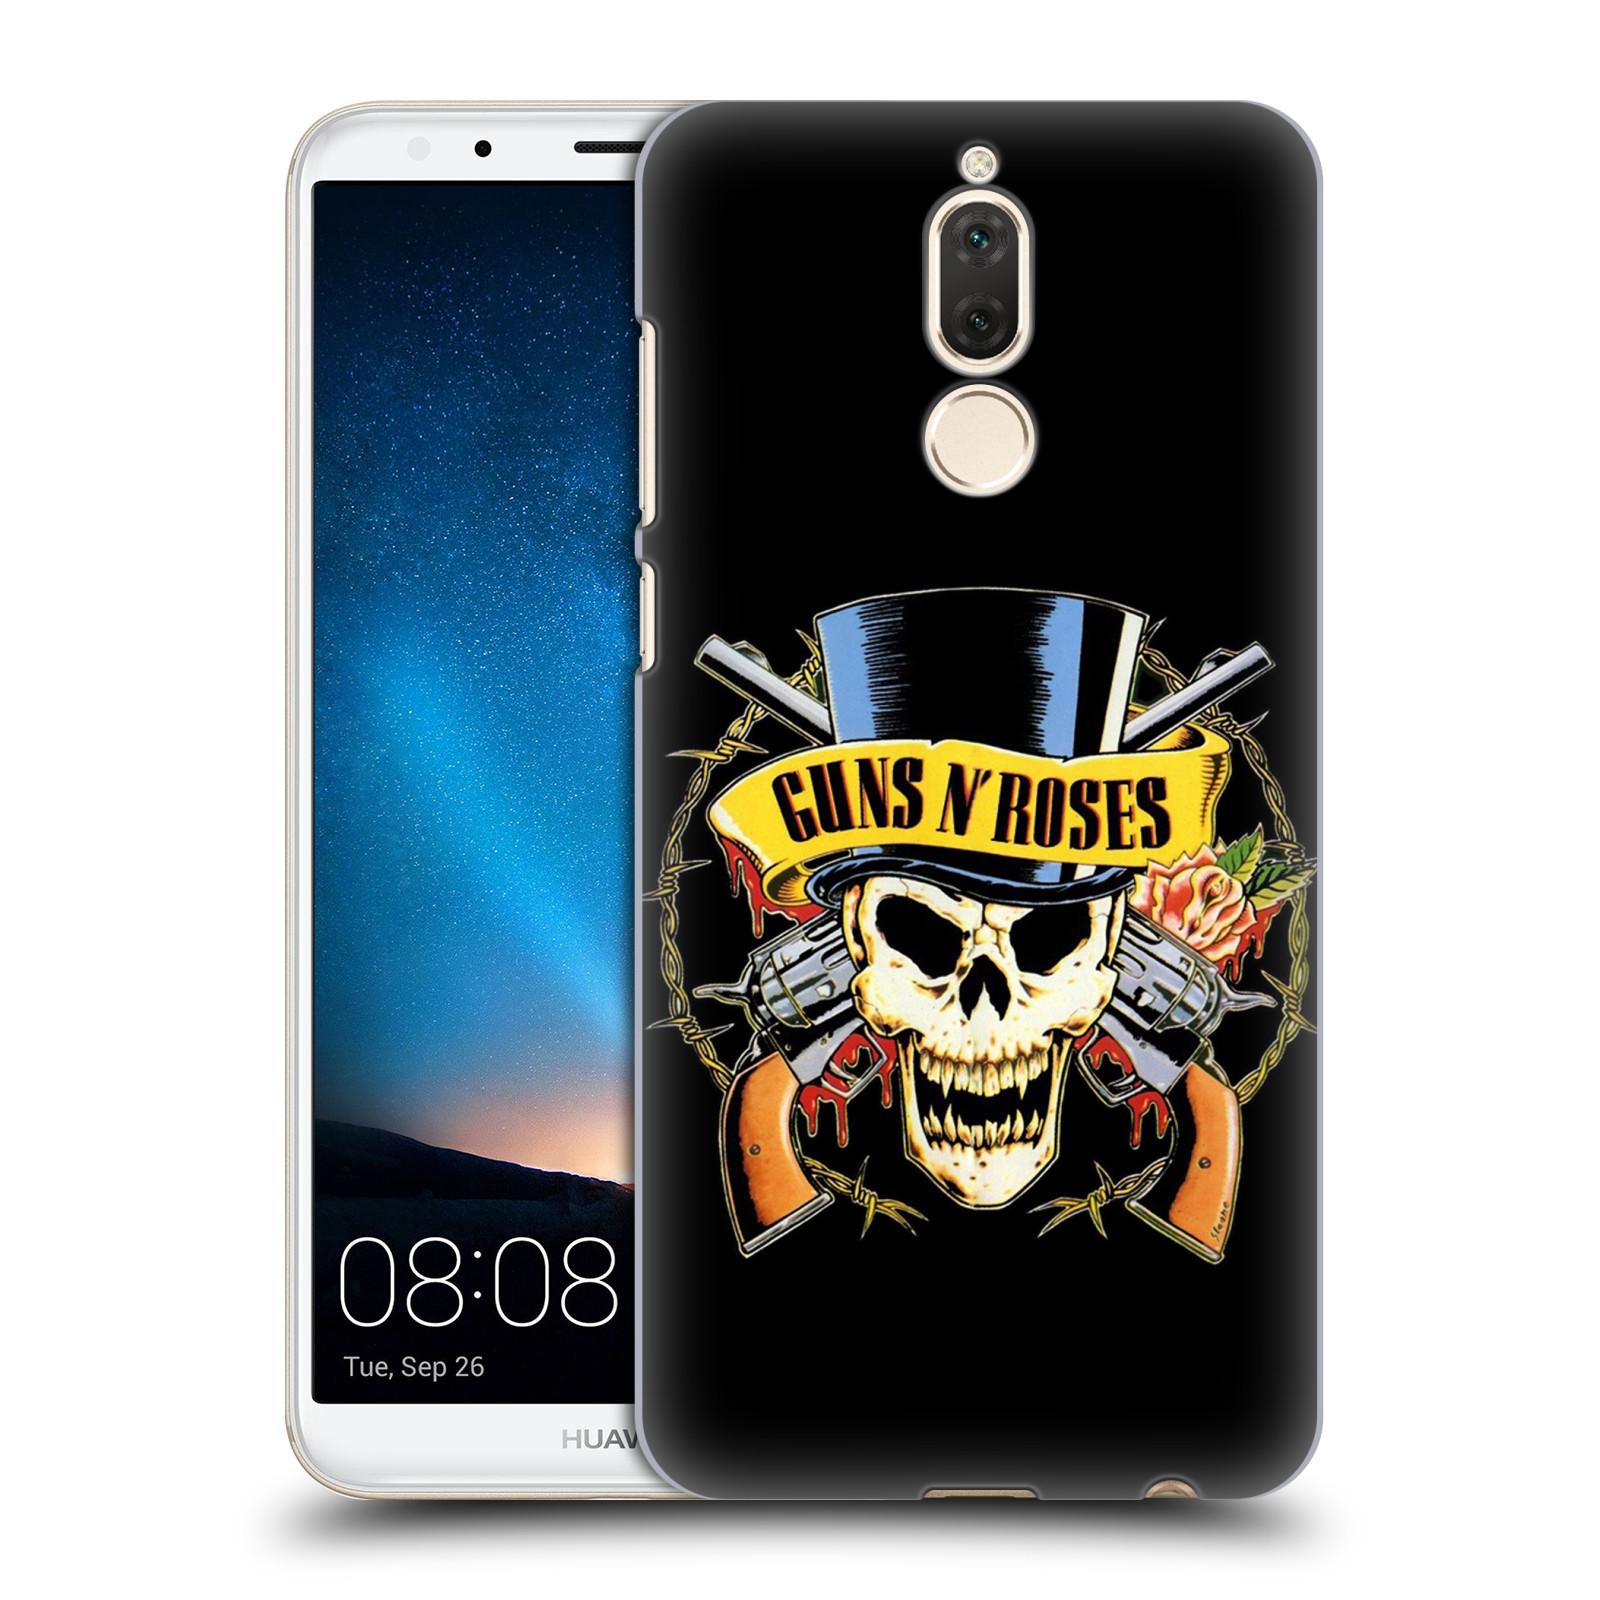 Plastové pouzdro na mobil Huawei Mate 10 Lite - Head Case - Guns N' Roses - Lebka